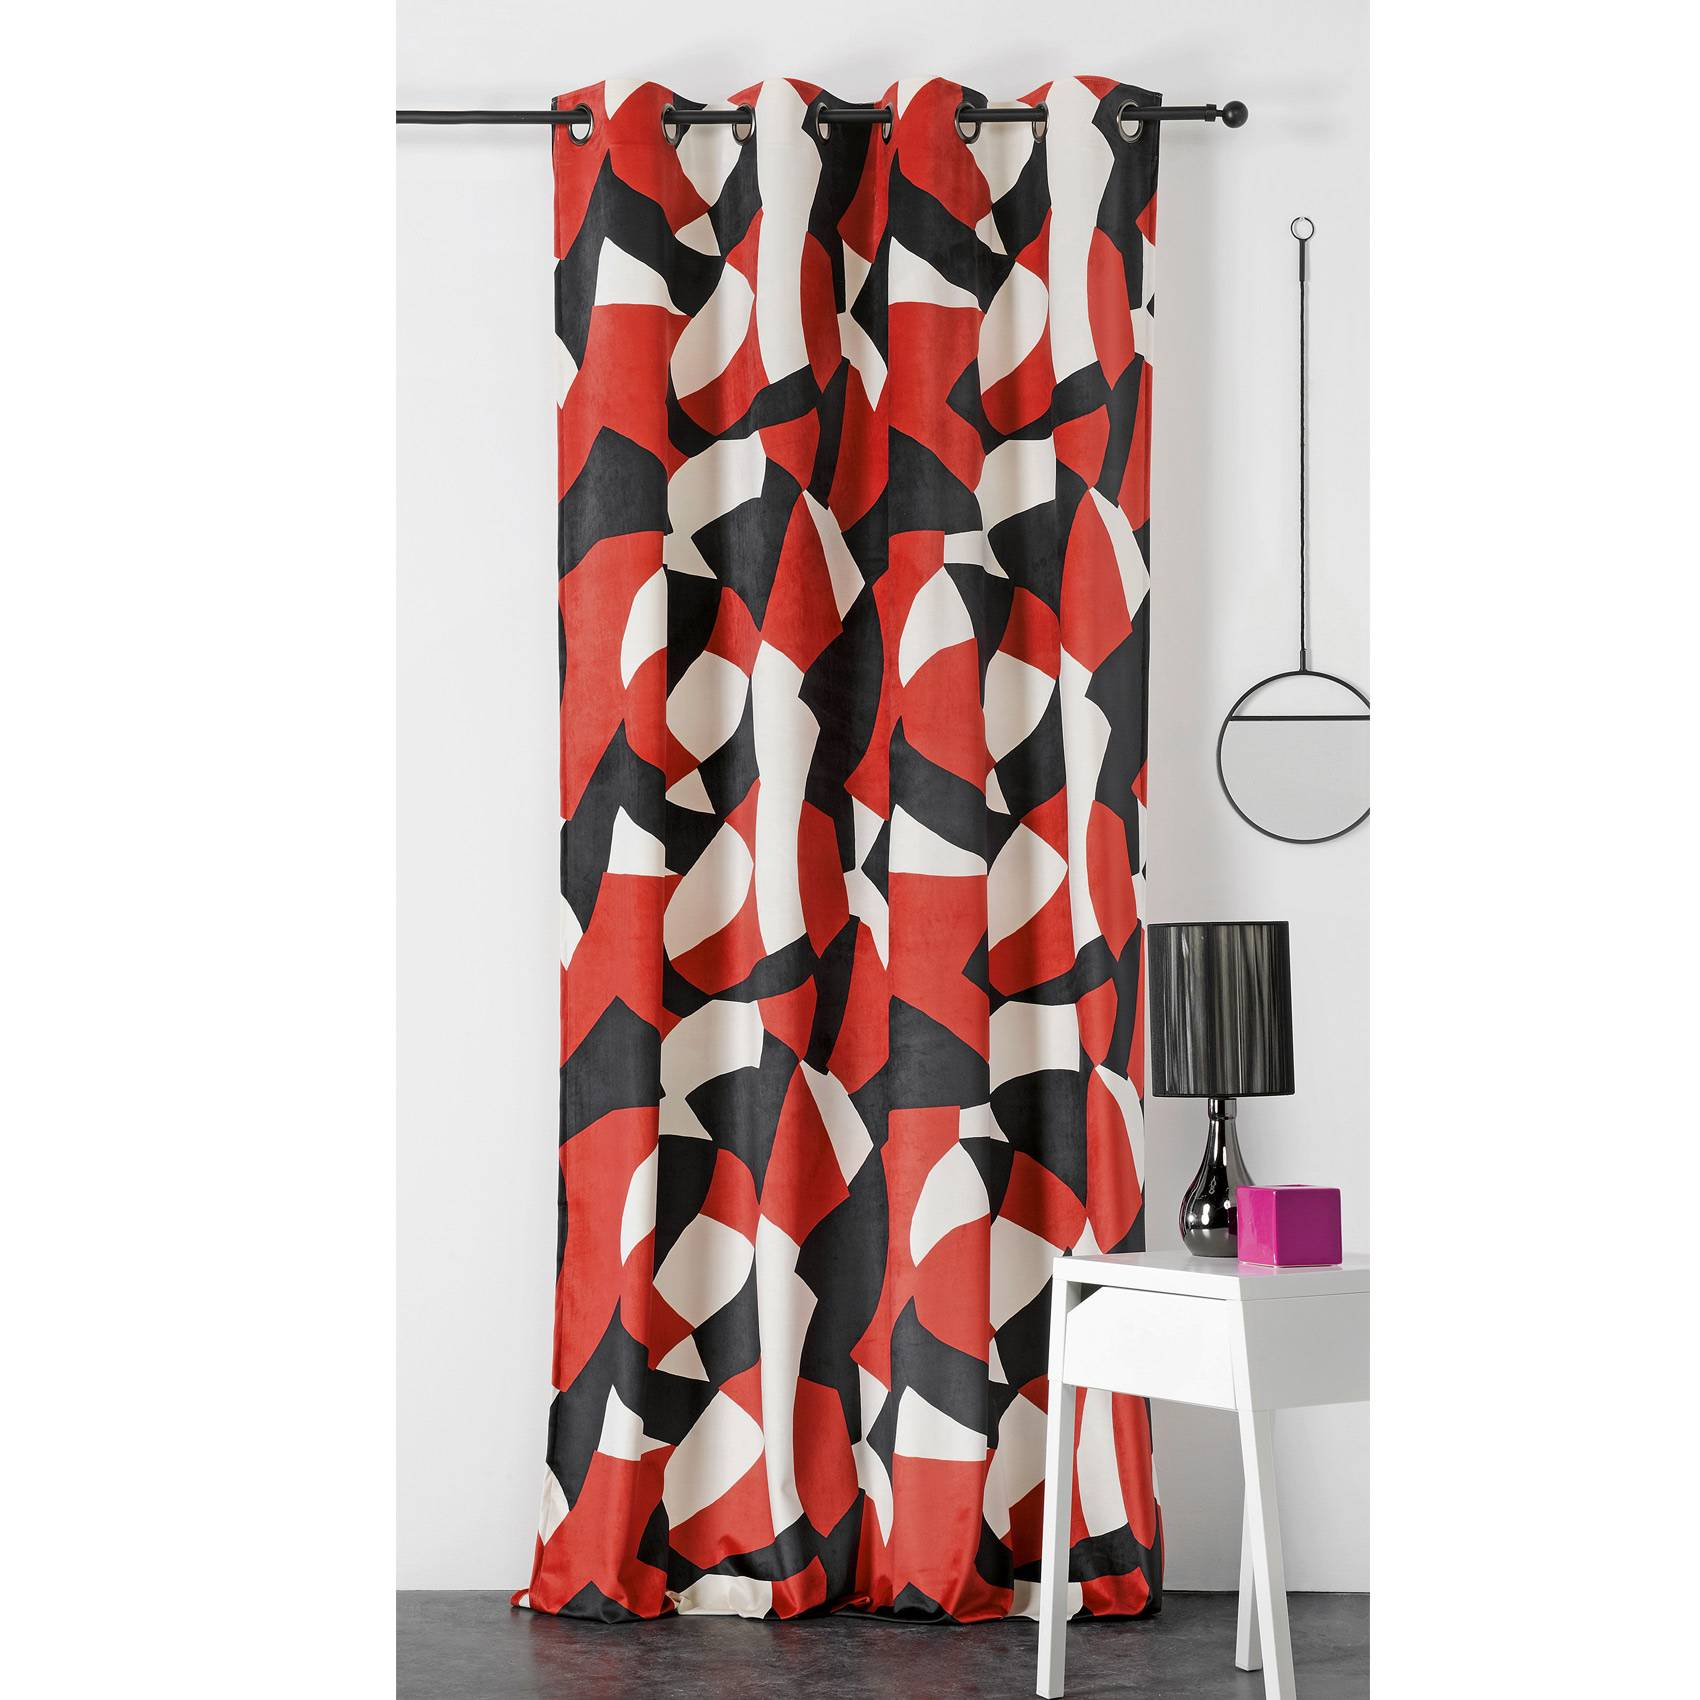 Linder Rideau d'ameublement camo polyester terracotta 240x145